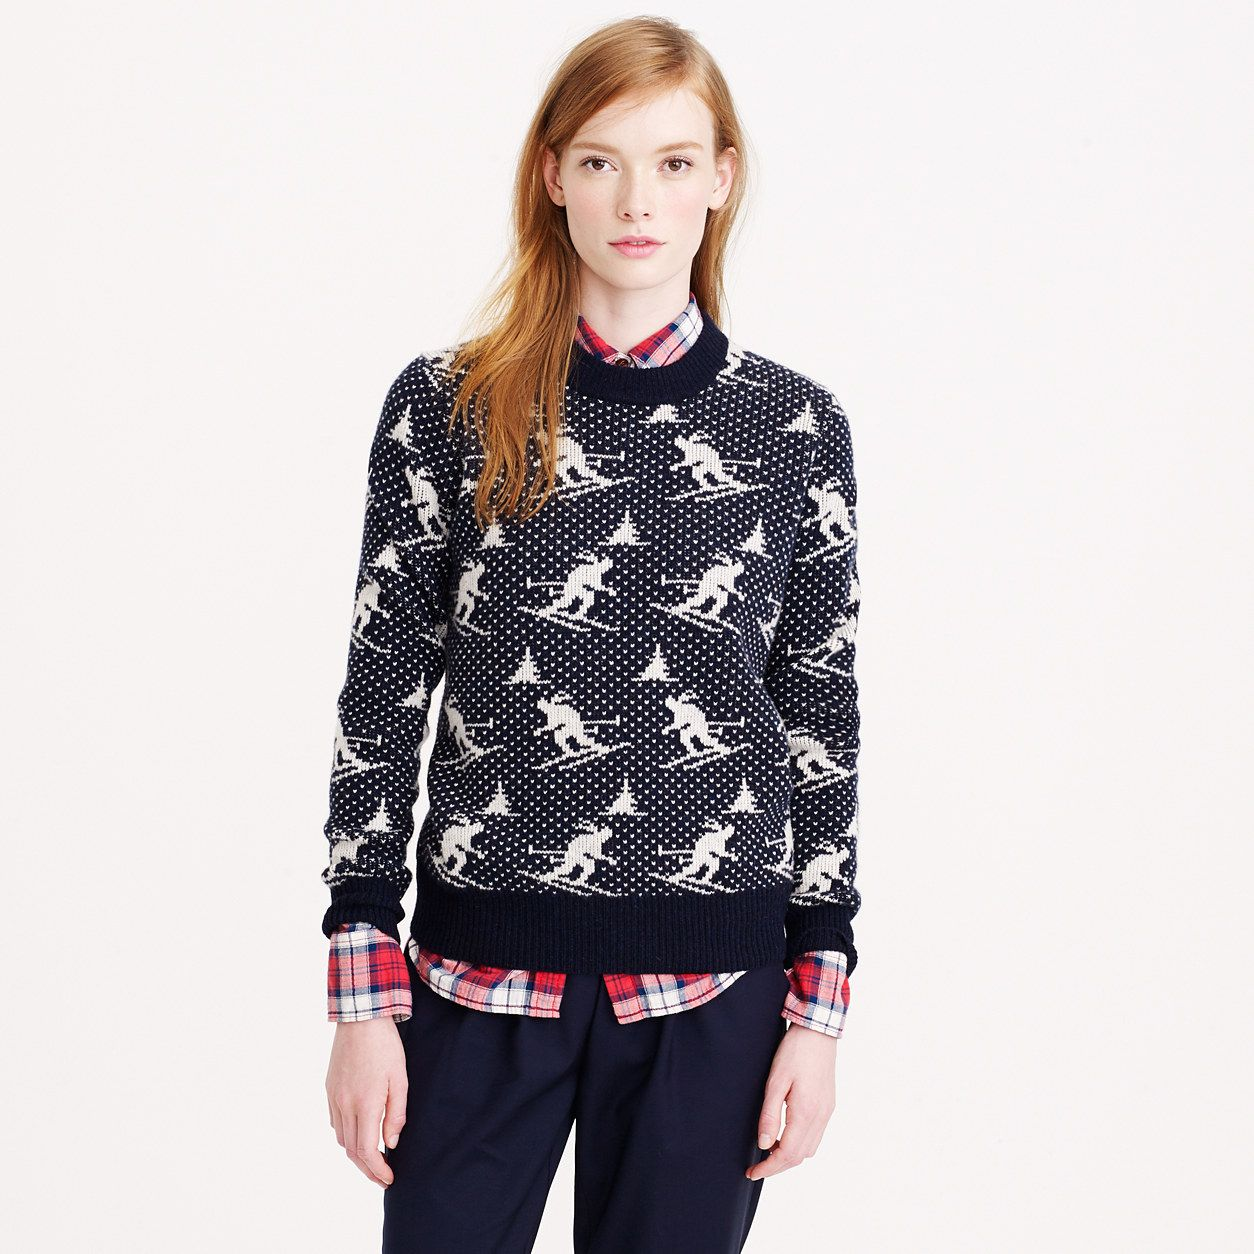 Ski sweater : sweaters | J.Crew